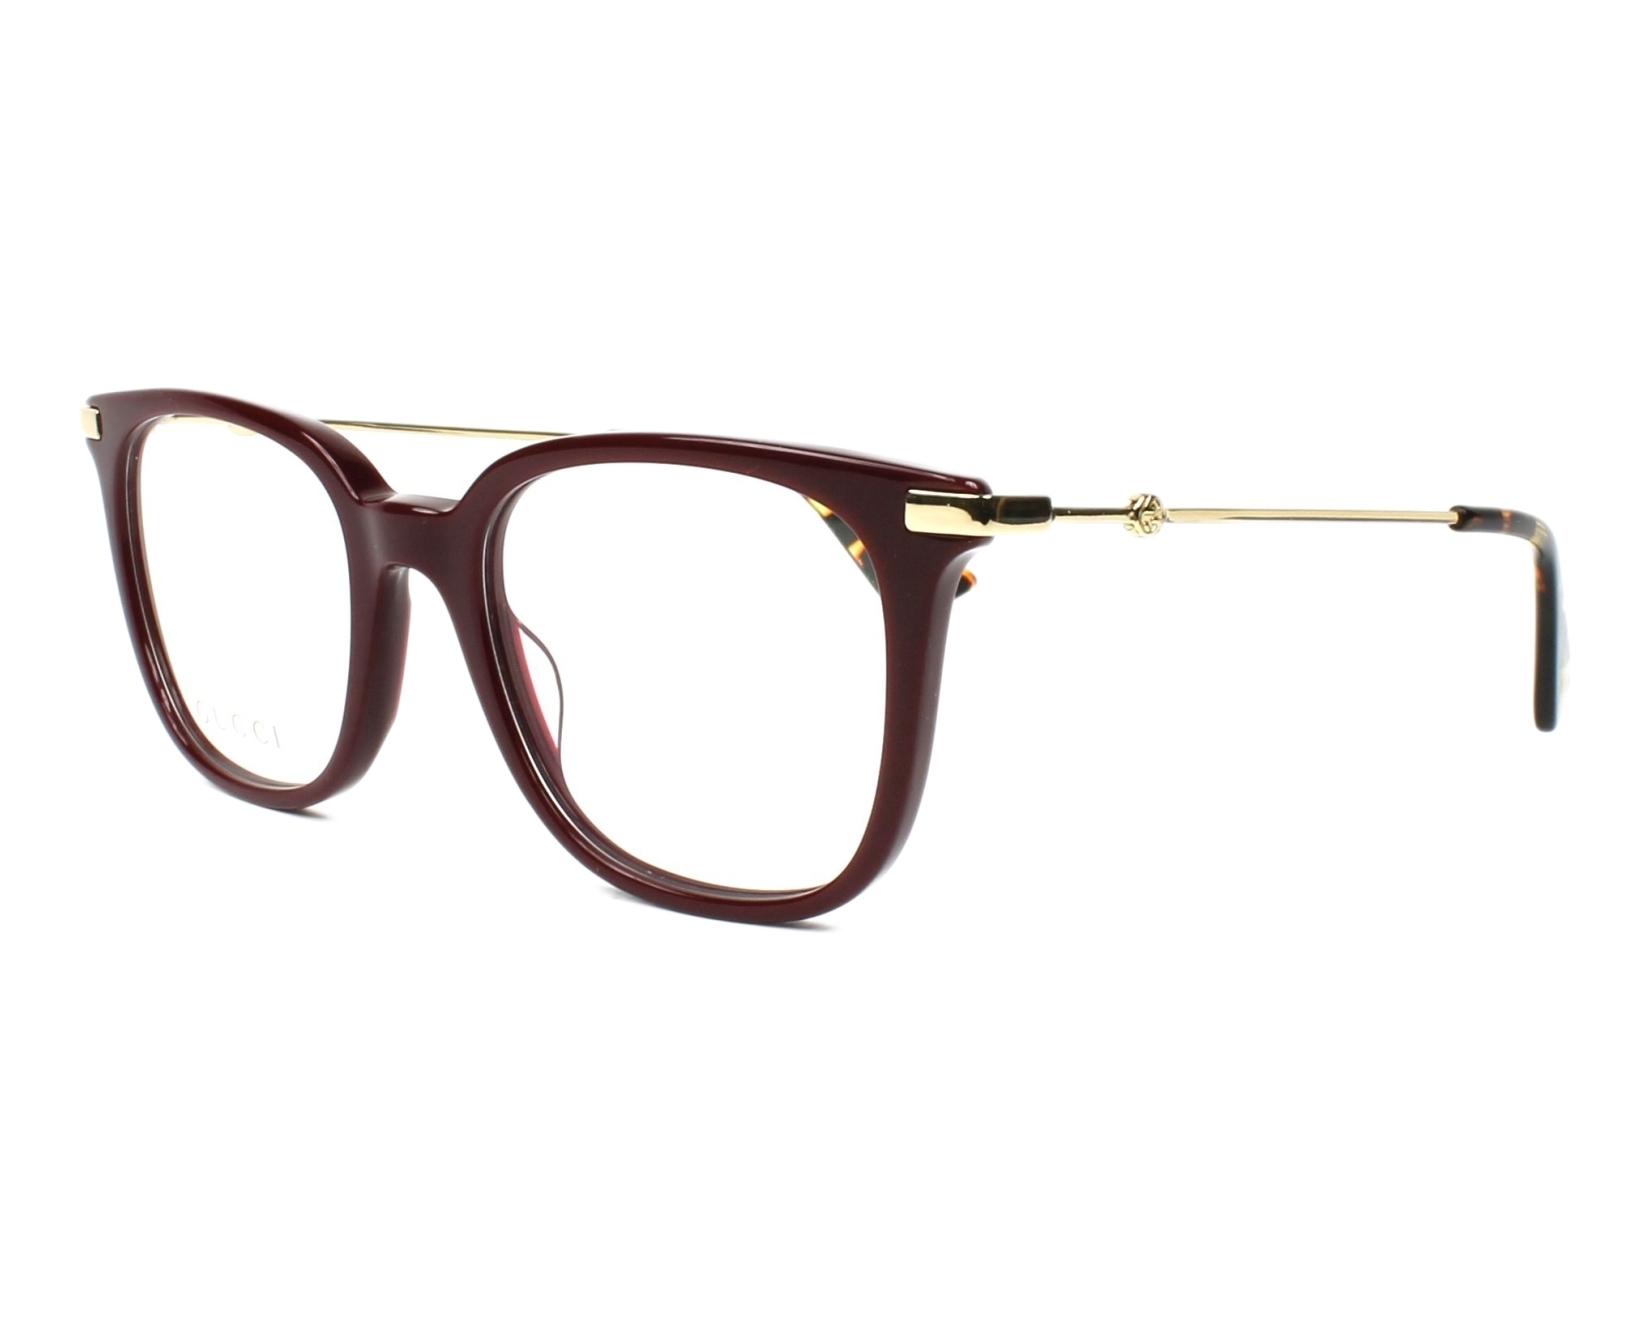 Gucci Eyeglasses Gg 01100 006 Bordeaux Visio Net Com